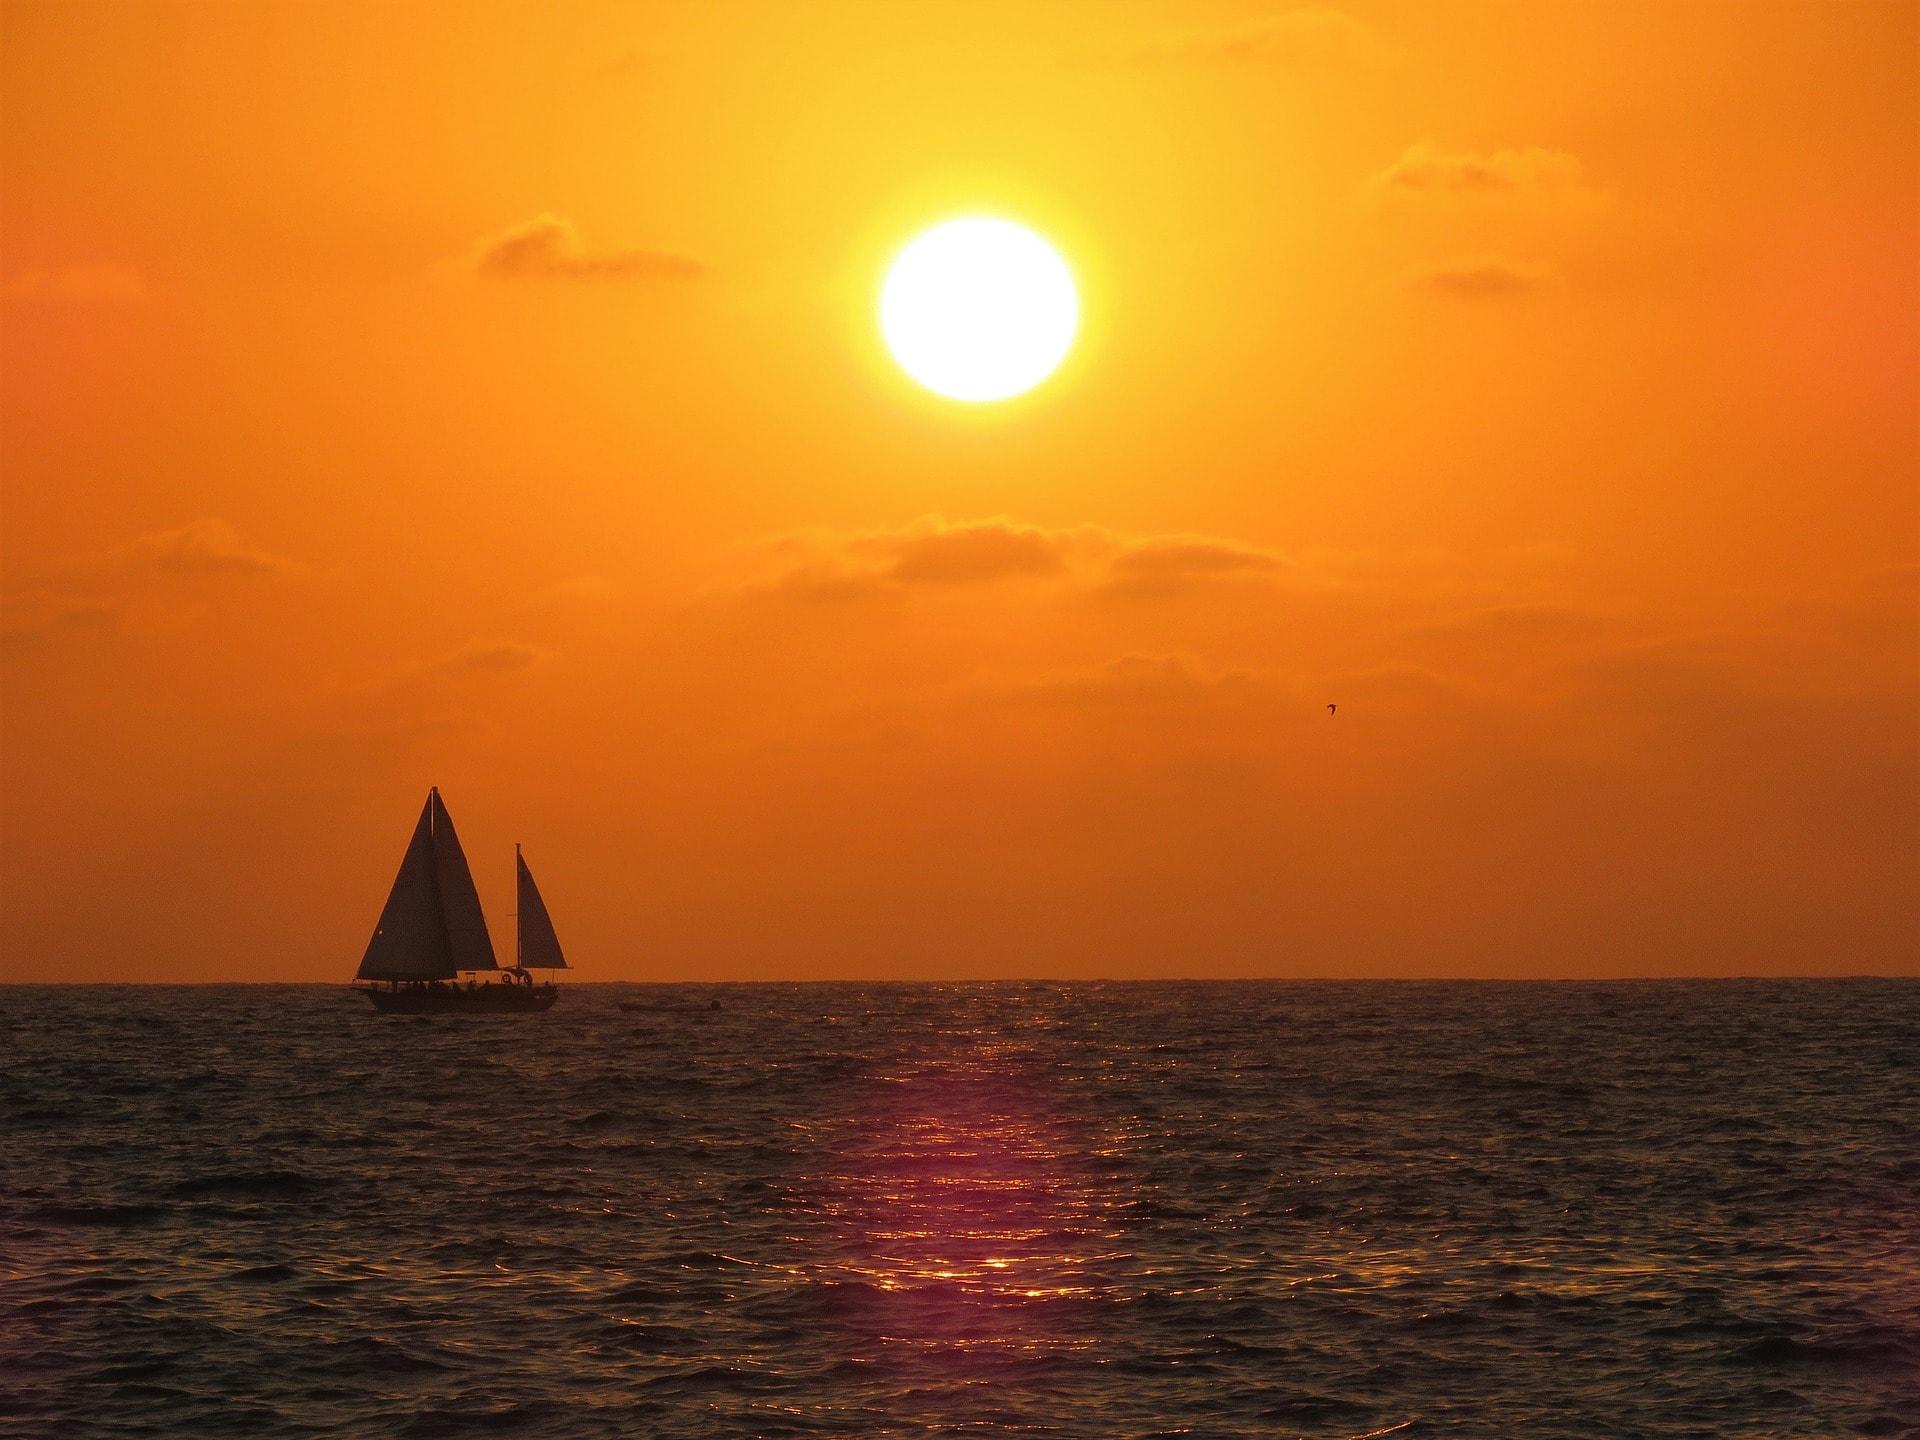 sunset-2832358_1920